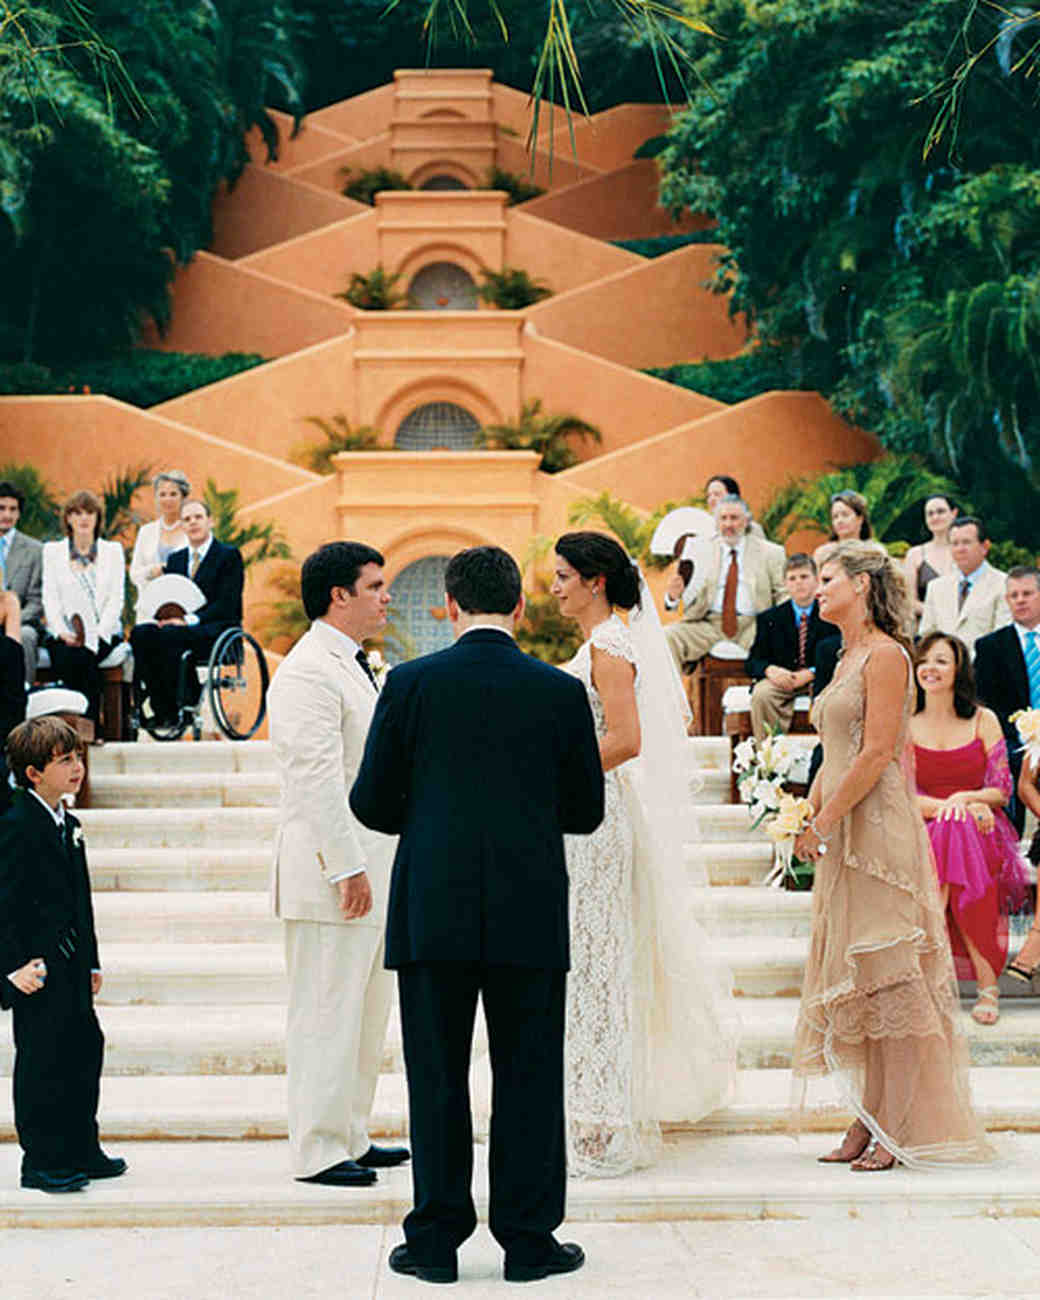 mwa103736_unionpacific_ceremony03.jpg